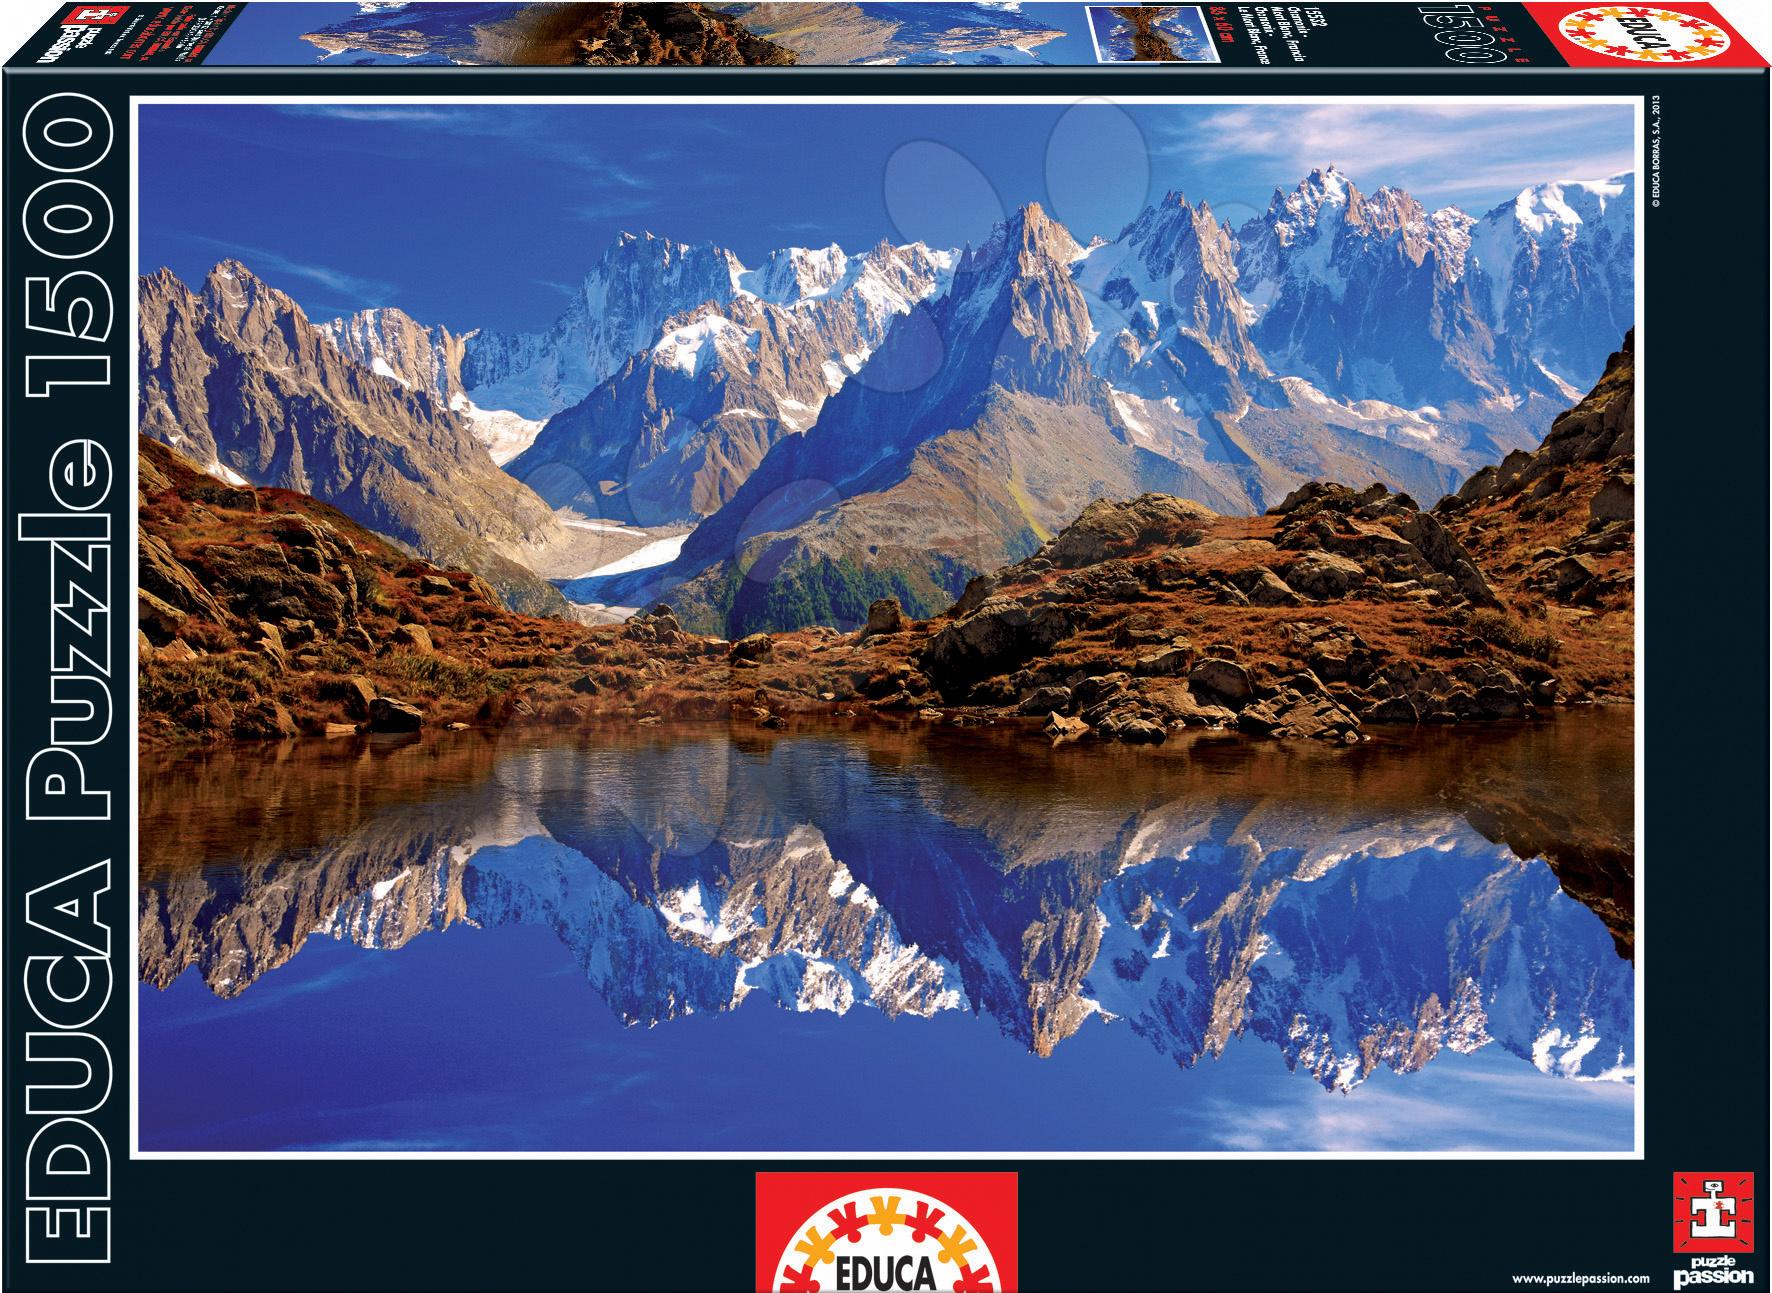 Puzzle 1500 dielne - Puzzle Chamonix - Mont Blanc Educa 1500 dielov